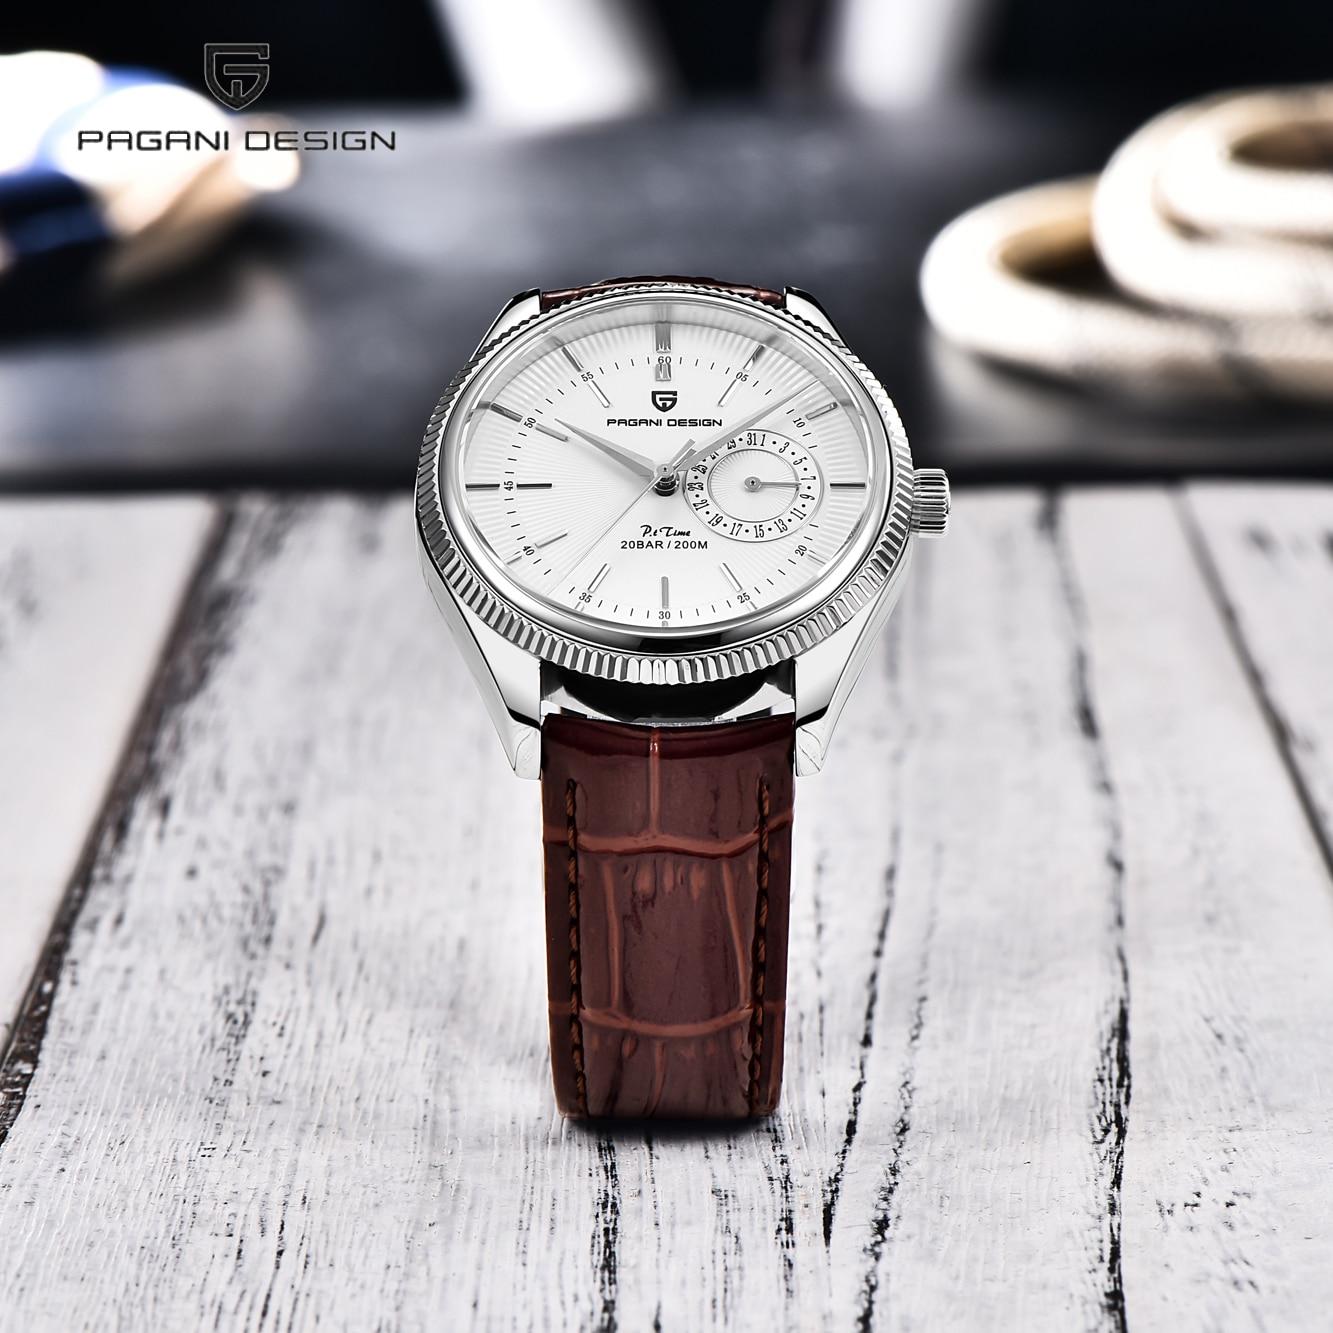 Pagani تصميم 2021 موضة جديدة بسيطة للرجال ساعة كوارتز الياقوت الزجاج 200 متر مقاوم للماء مضيئة التقويم ساعة Relogio Masculino